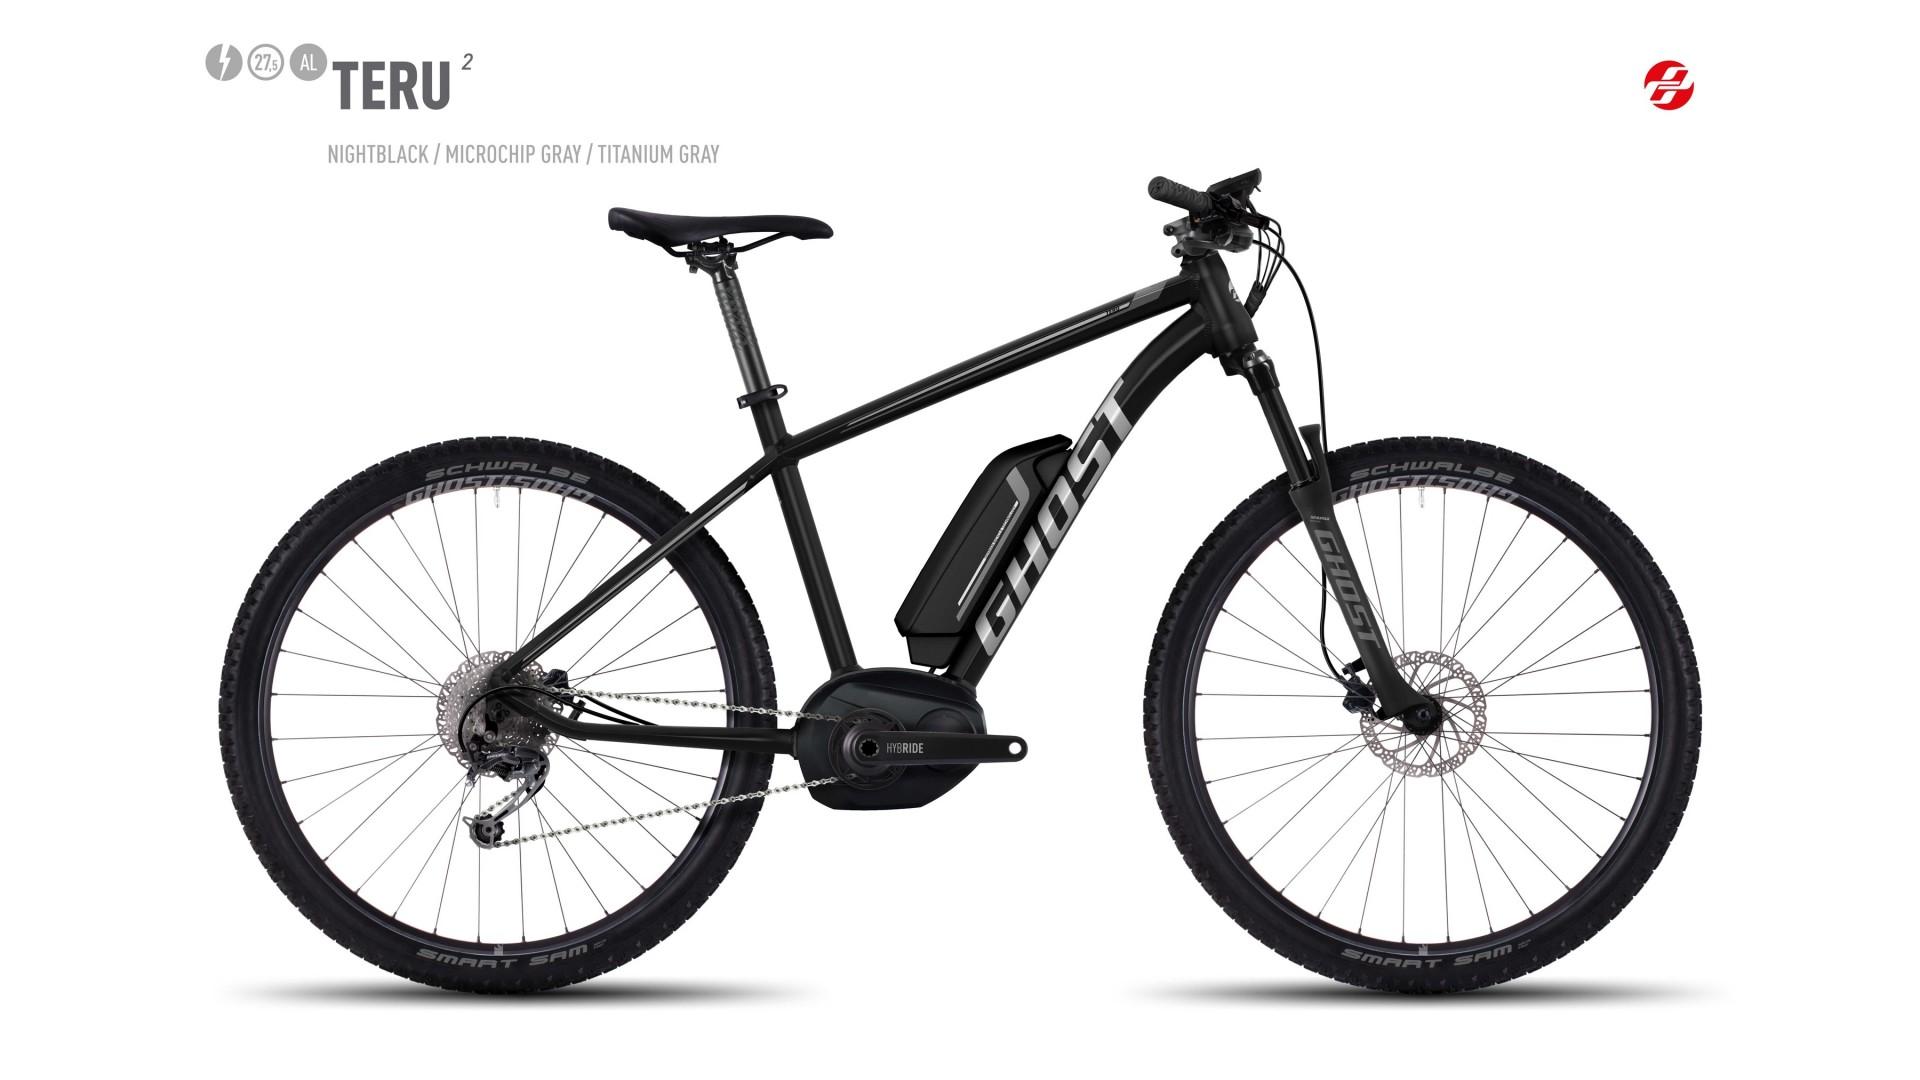 Электровелосипед GHOST Teru 2 AL 27.5 nightblack/microchipgrey/titaniumgrey год 2017